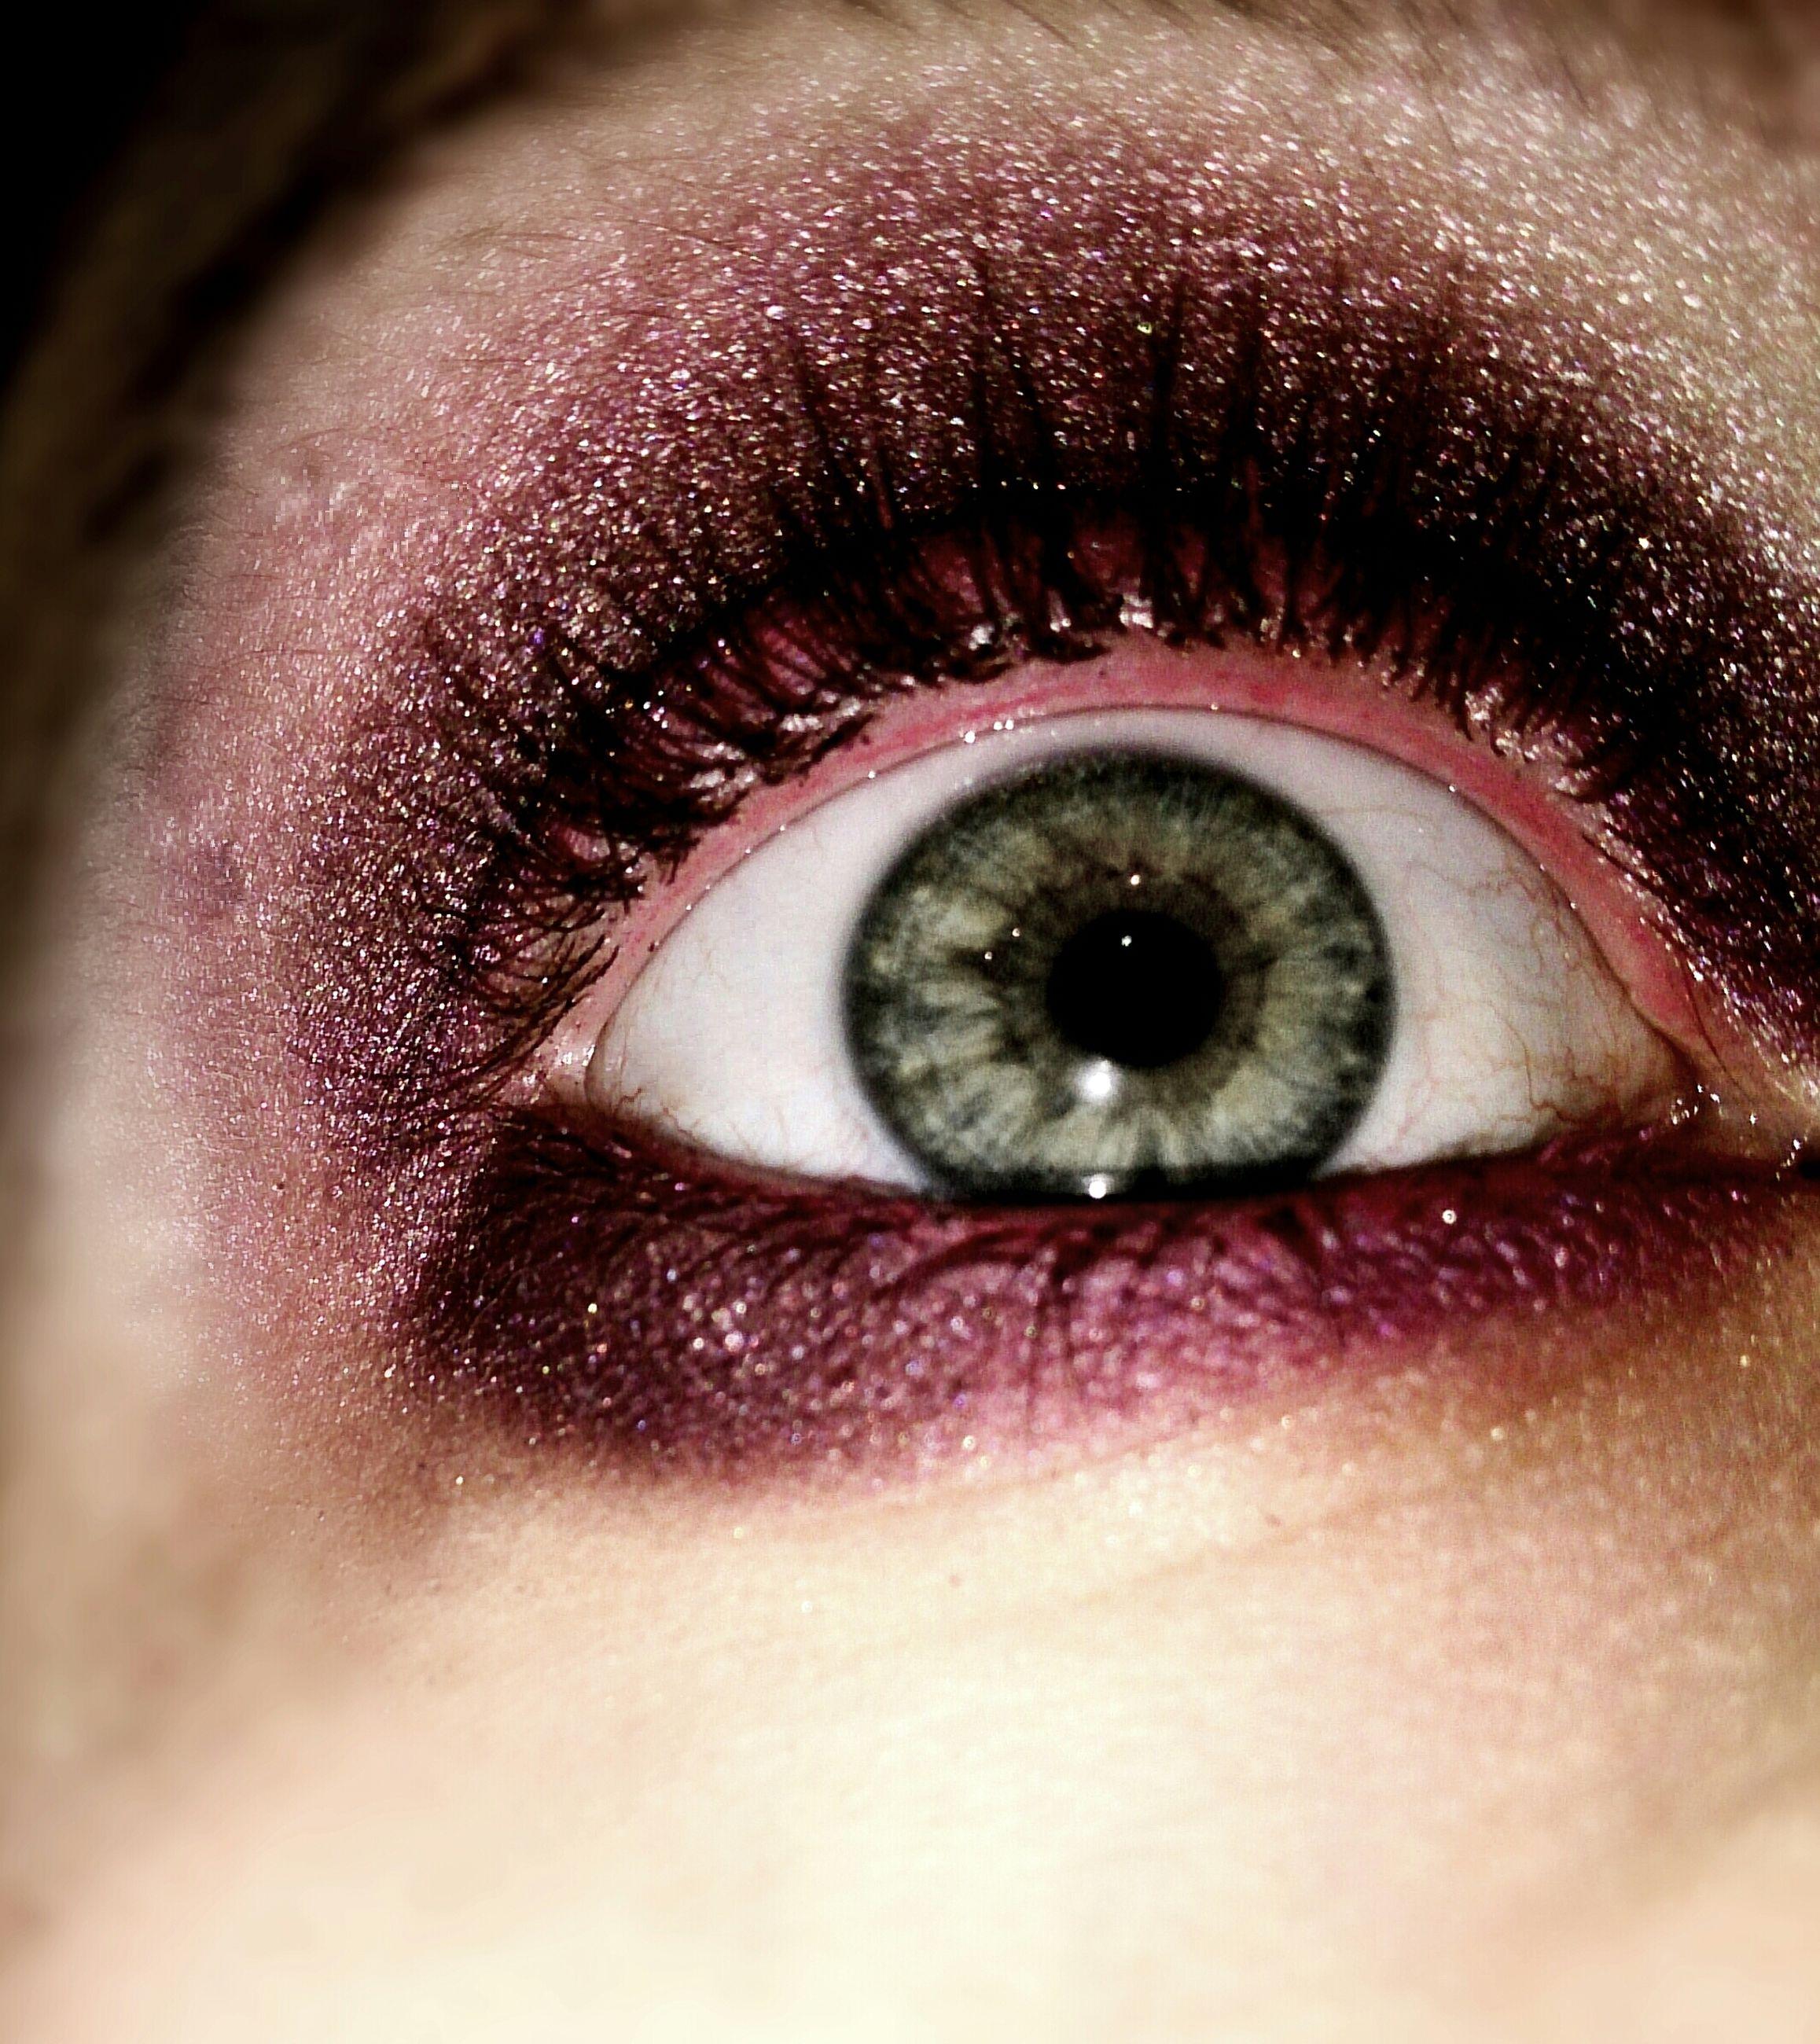 human eye, close-up, eyelash, eyesight, extreme close-up, sensory perception, part of, extreme close up, iris - eye, lifestyles, indoors, eyeball, portrait, looking at camera, human skin, selective focus, human face